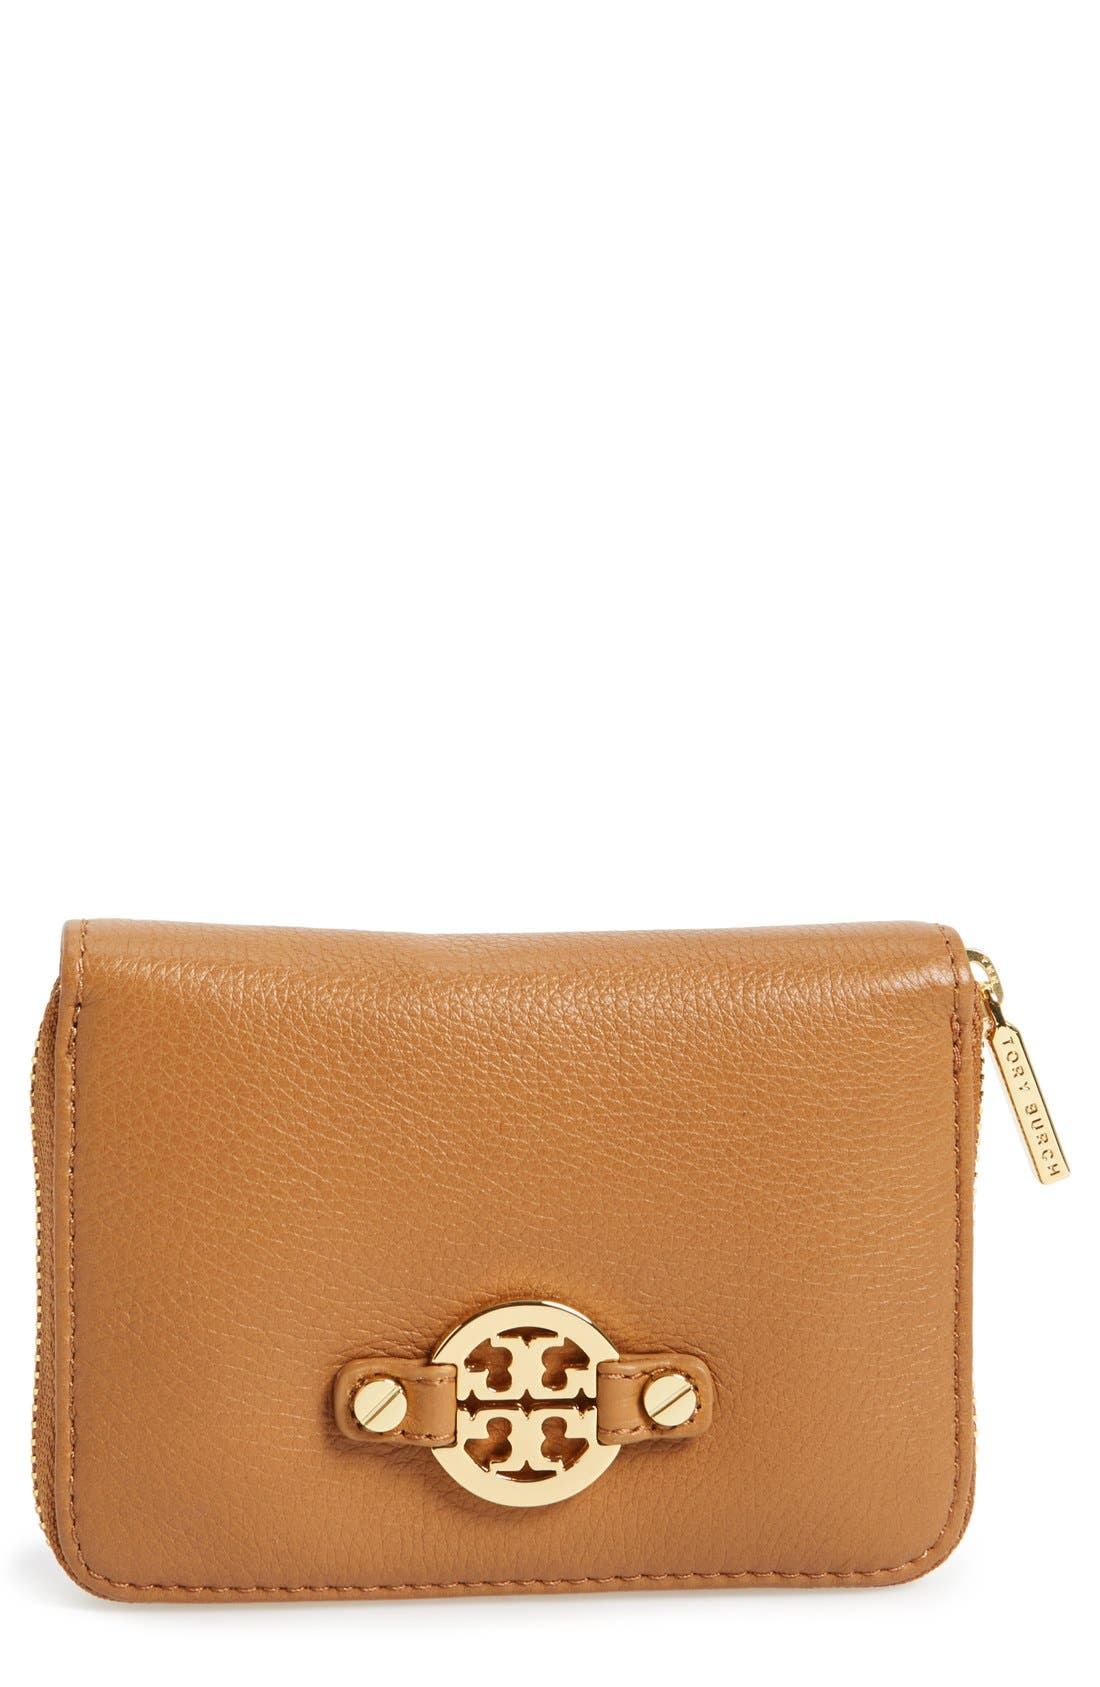 Main Image - Tory Burch 'Amanda' Leather Coin Case